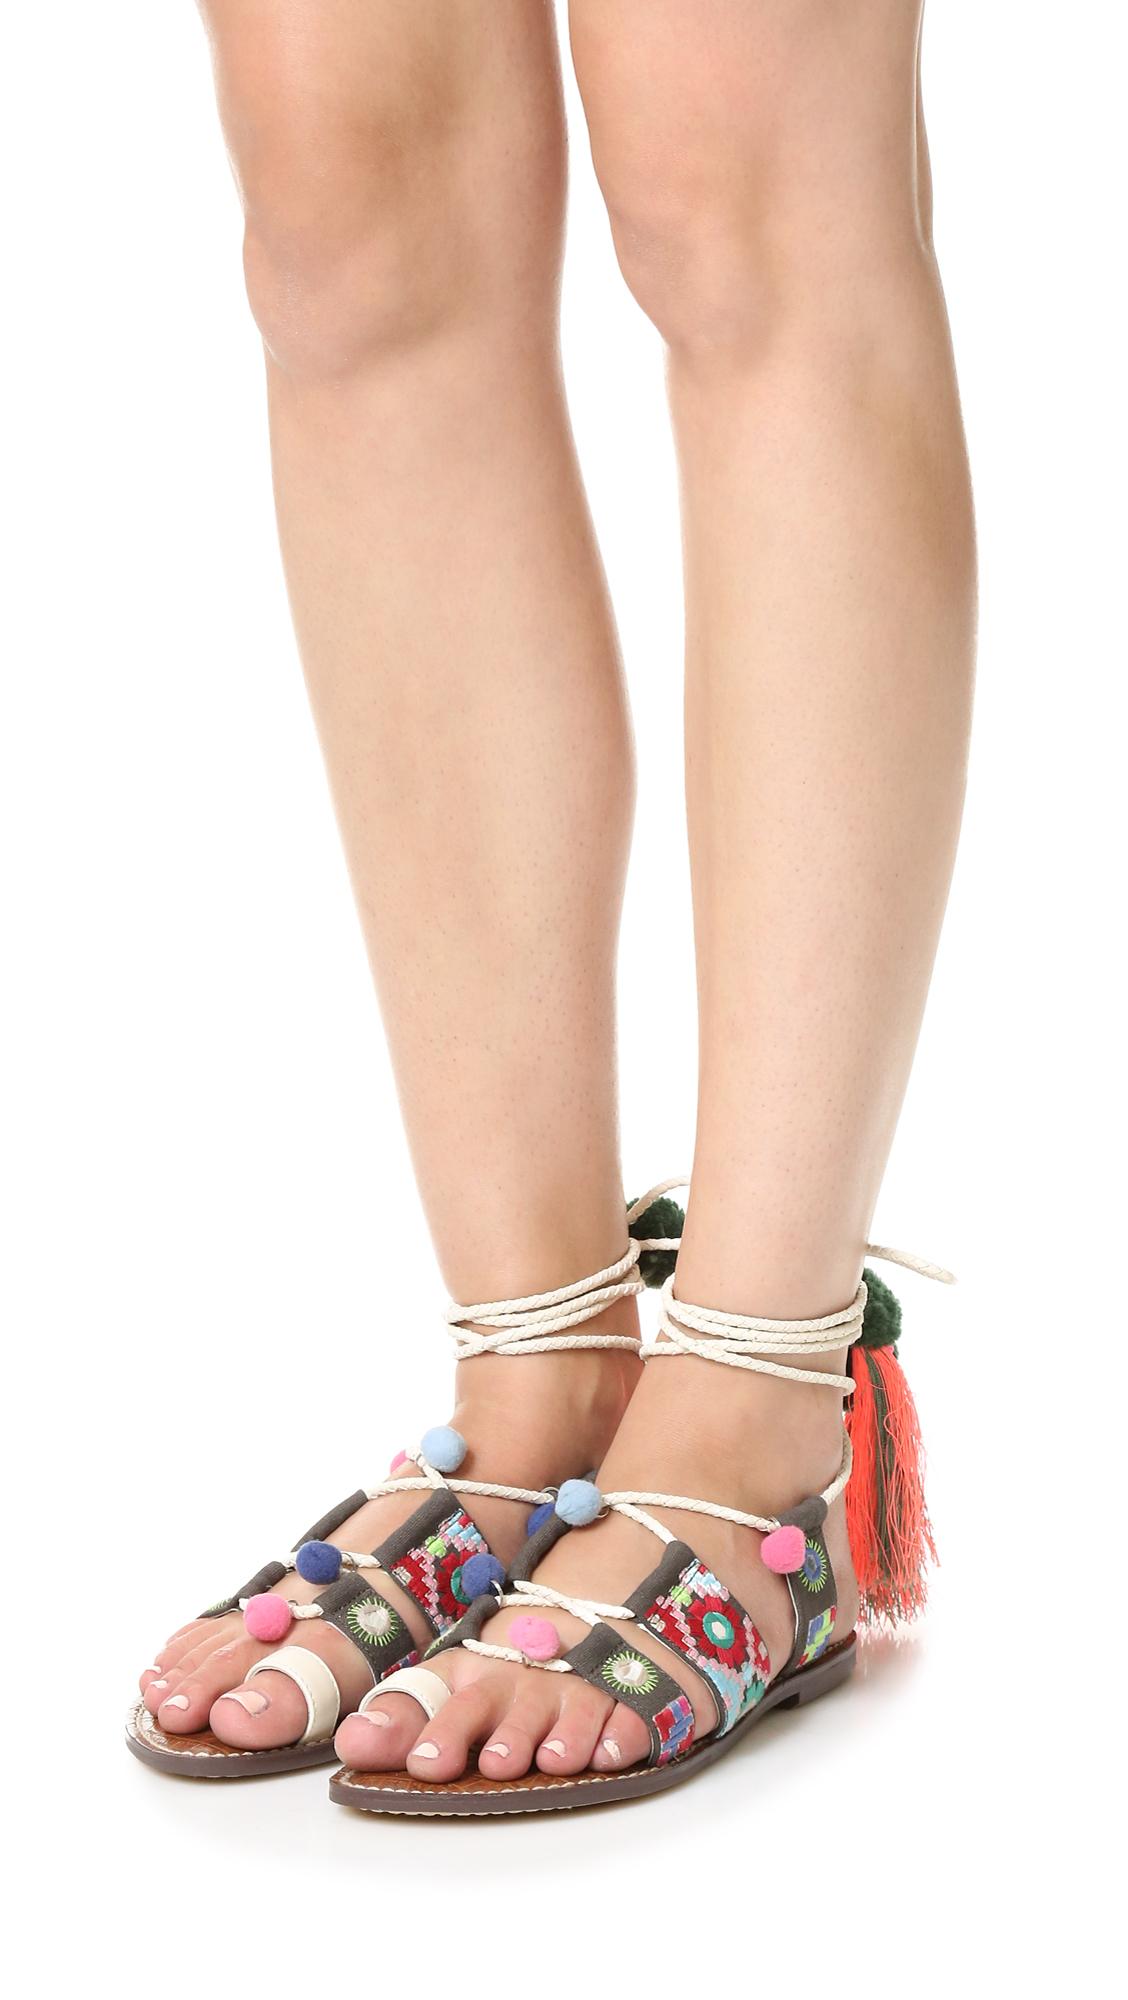 72f8f3b28e1646 Lyst - Sam Edelman Gretchen Leather Sandals